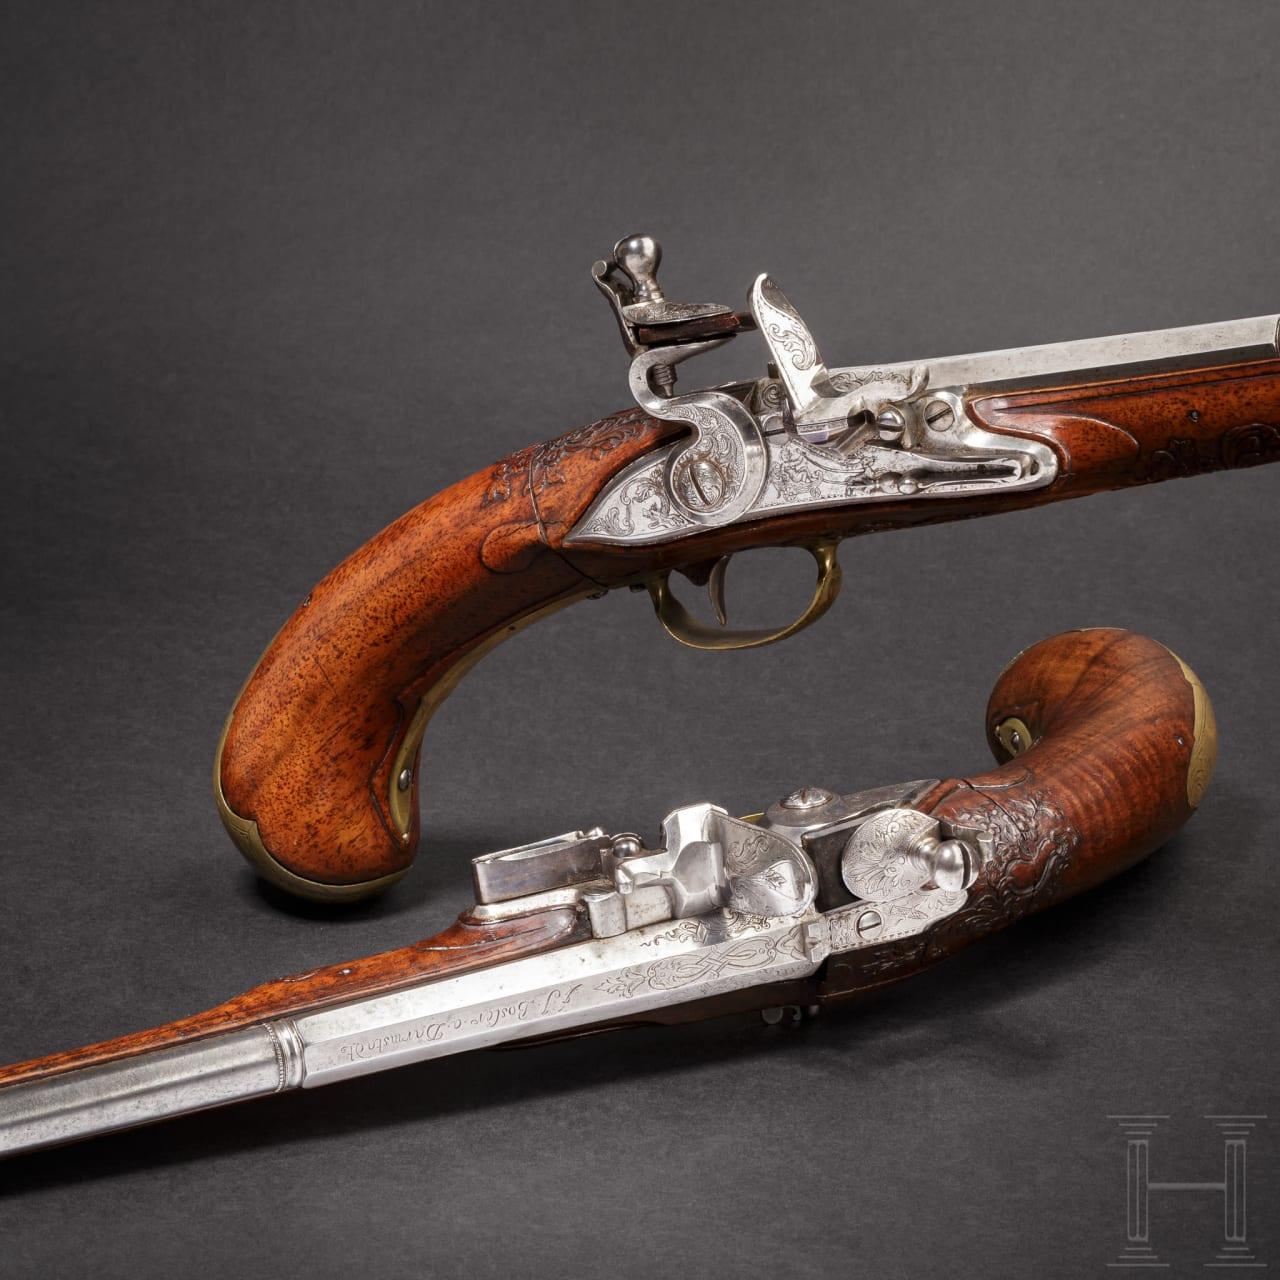 A rare pair of air pistols, designed to resemble a flintlock, Friedrich Jacob Bosler of Darmstadt, circa 1740/50